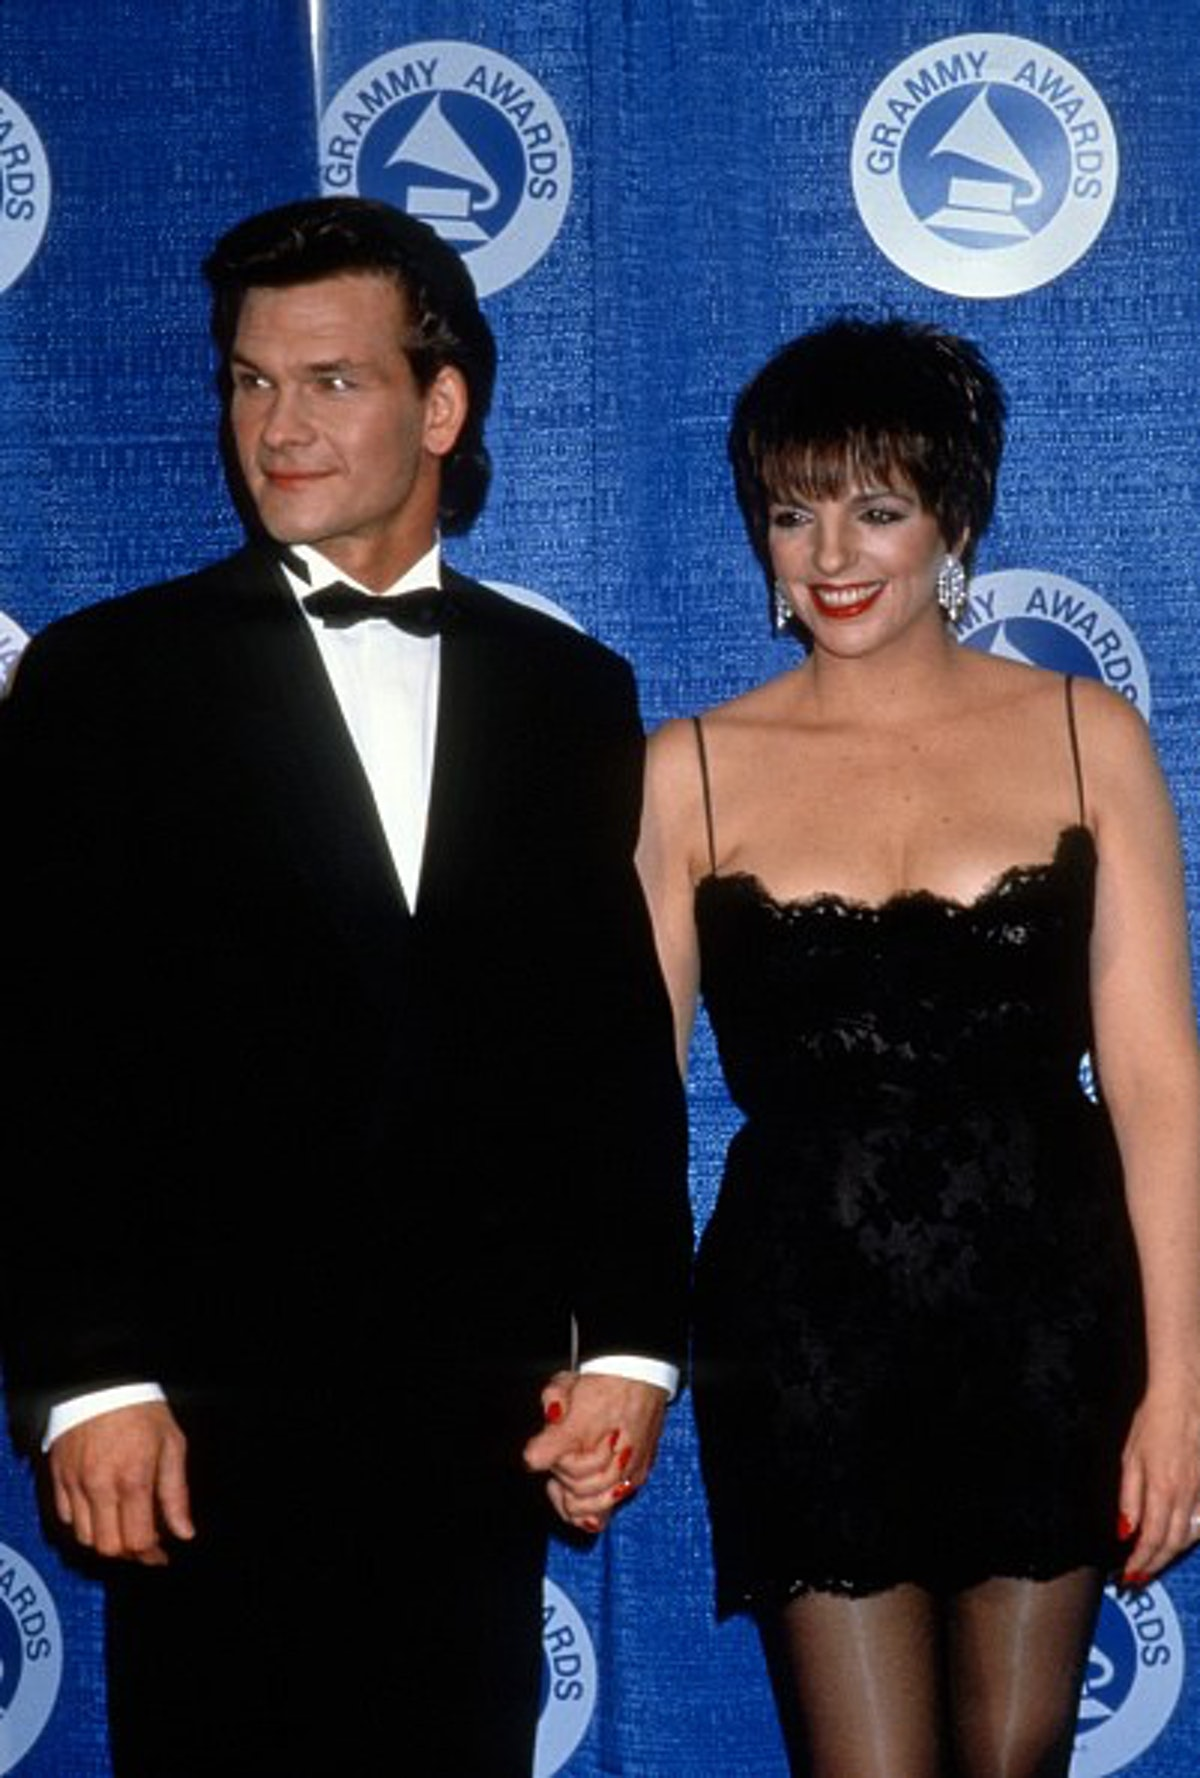 Liza in a form-fitting short black spaghetti strap dress